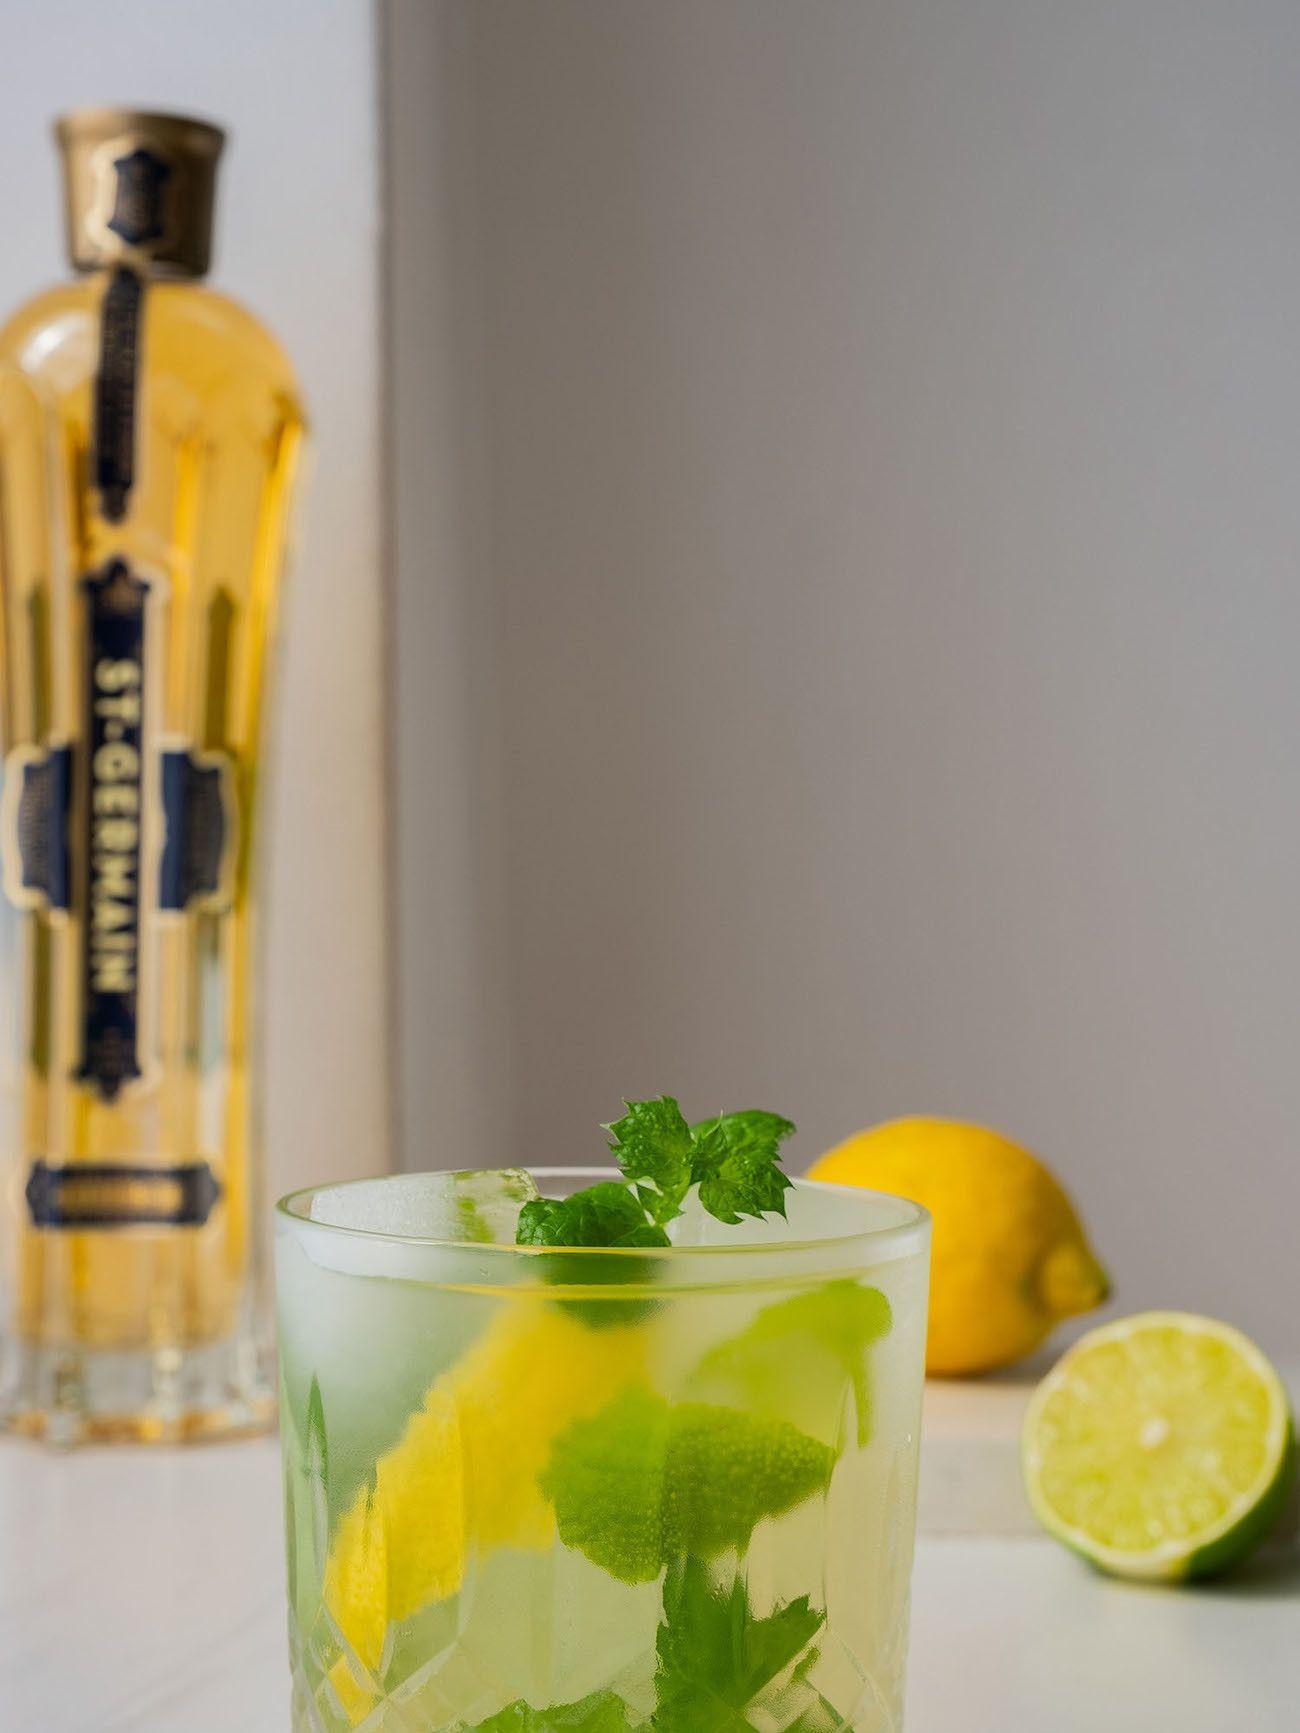 Foodblog About Fuel, Rezept Power Hugo, Saint Germain, Drink, Limette, Zitrone